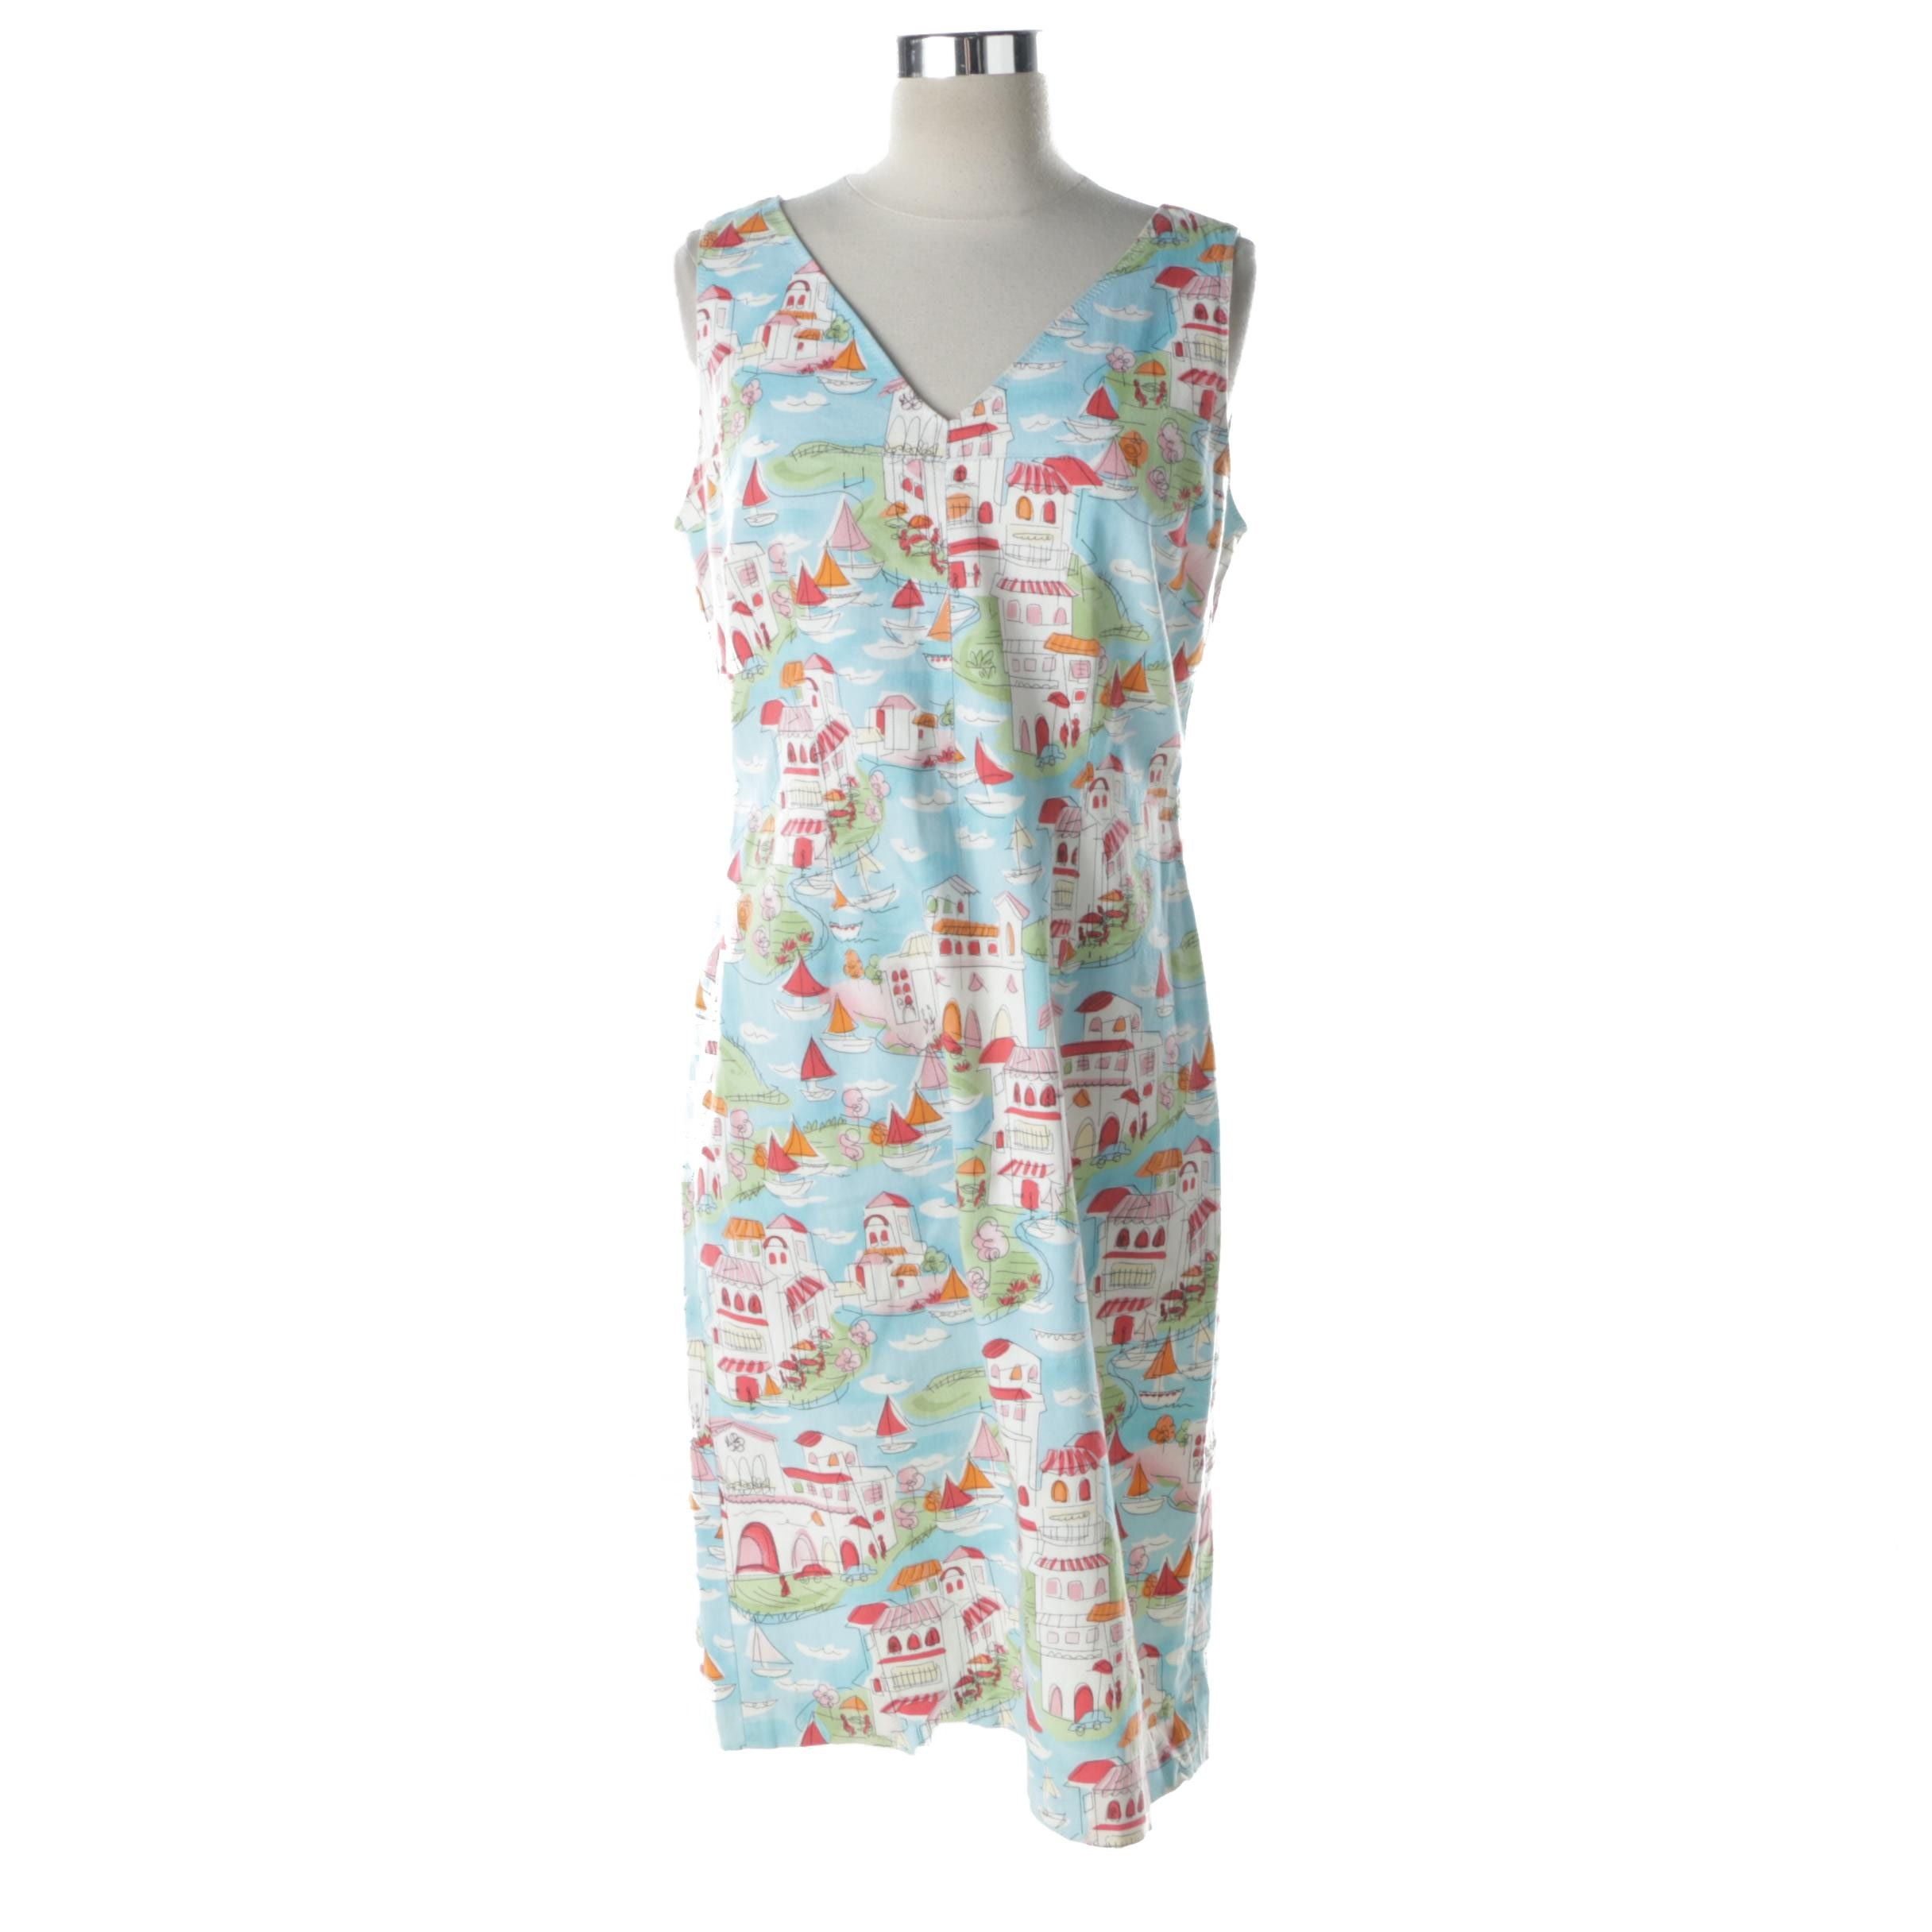 Women's Talbots Petites Sleeveless Dress